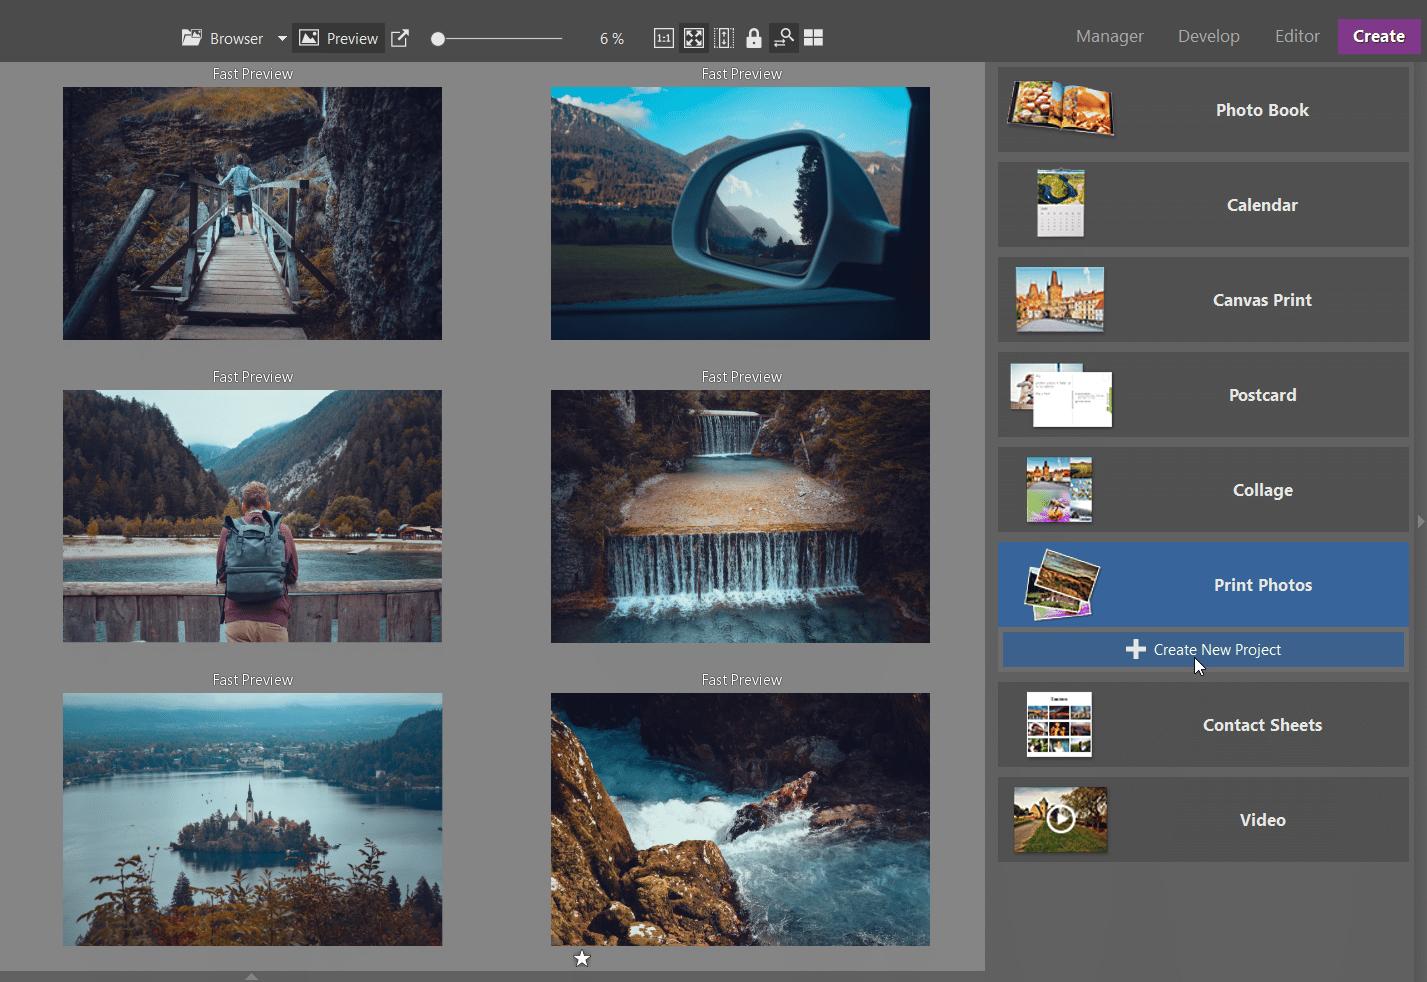 Looking to Order Prints Online? Order Prints Right in Zoner Photo Studio X